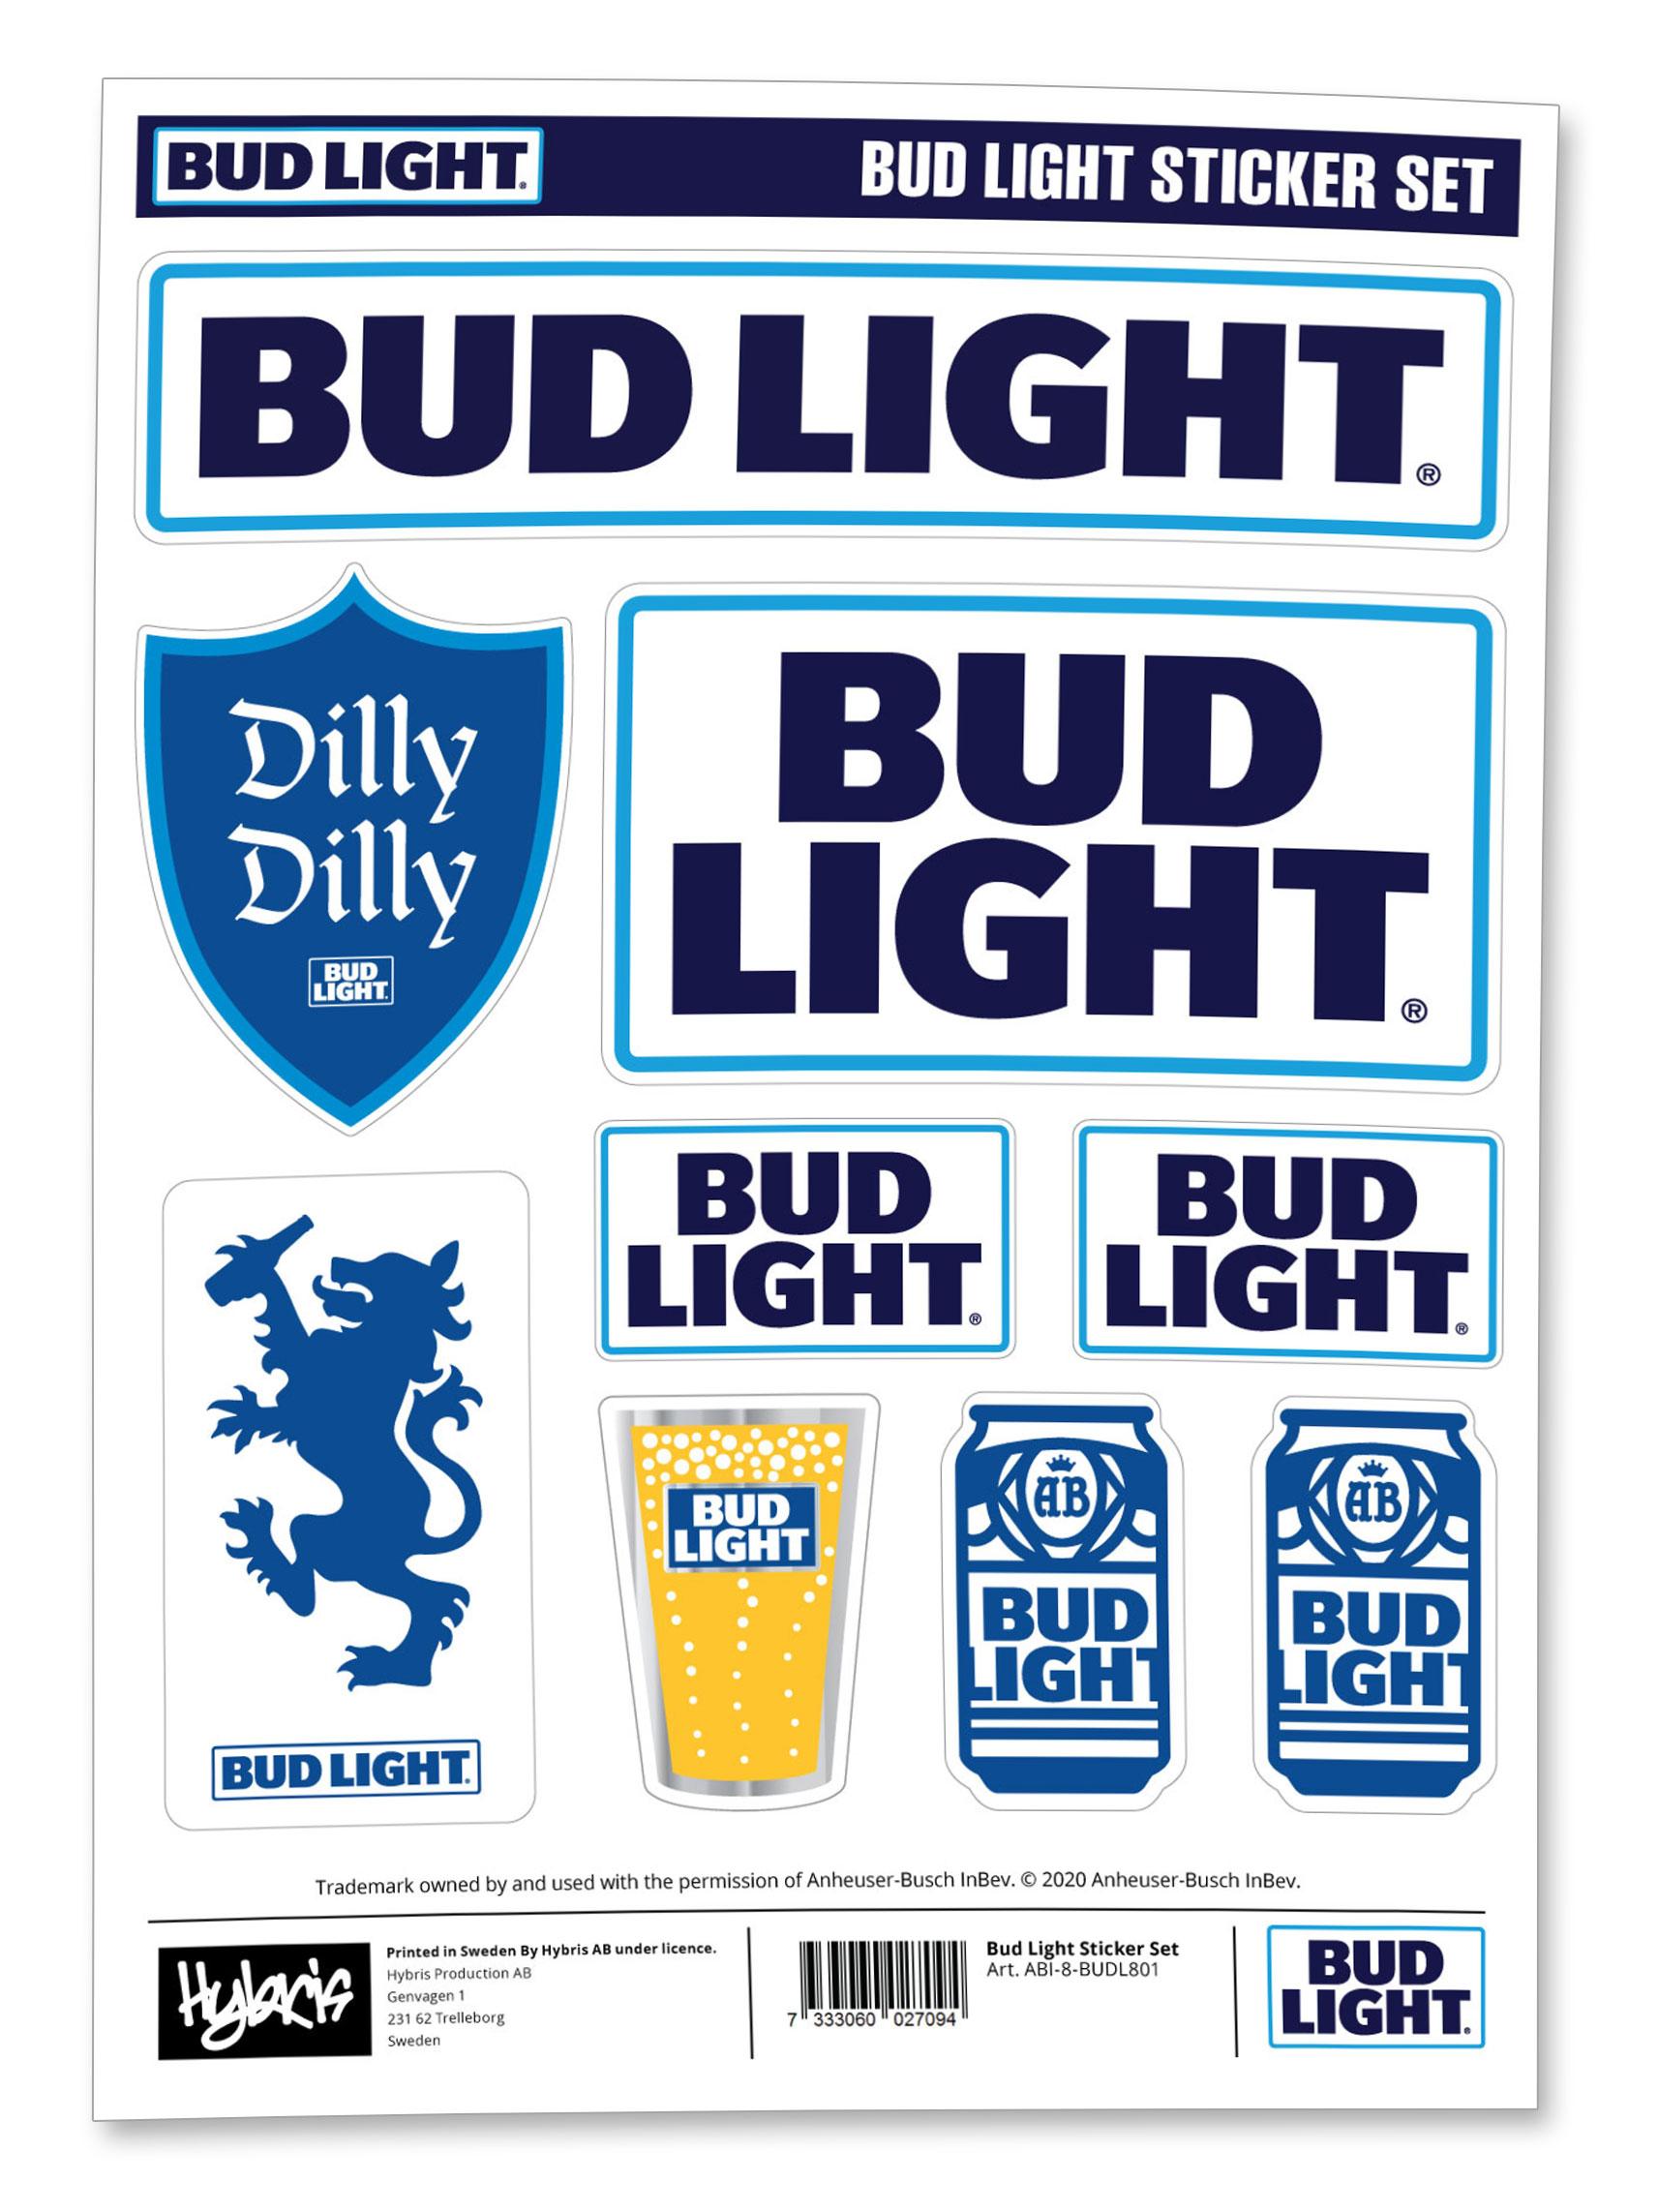 Bud Light Sticker Set